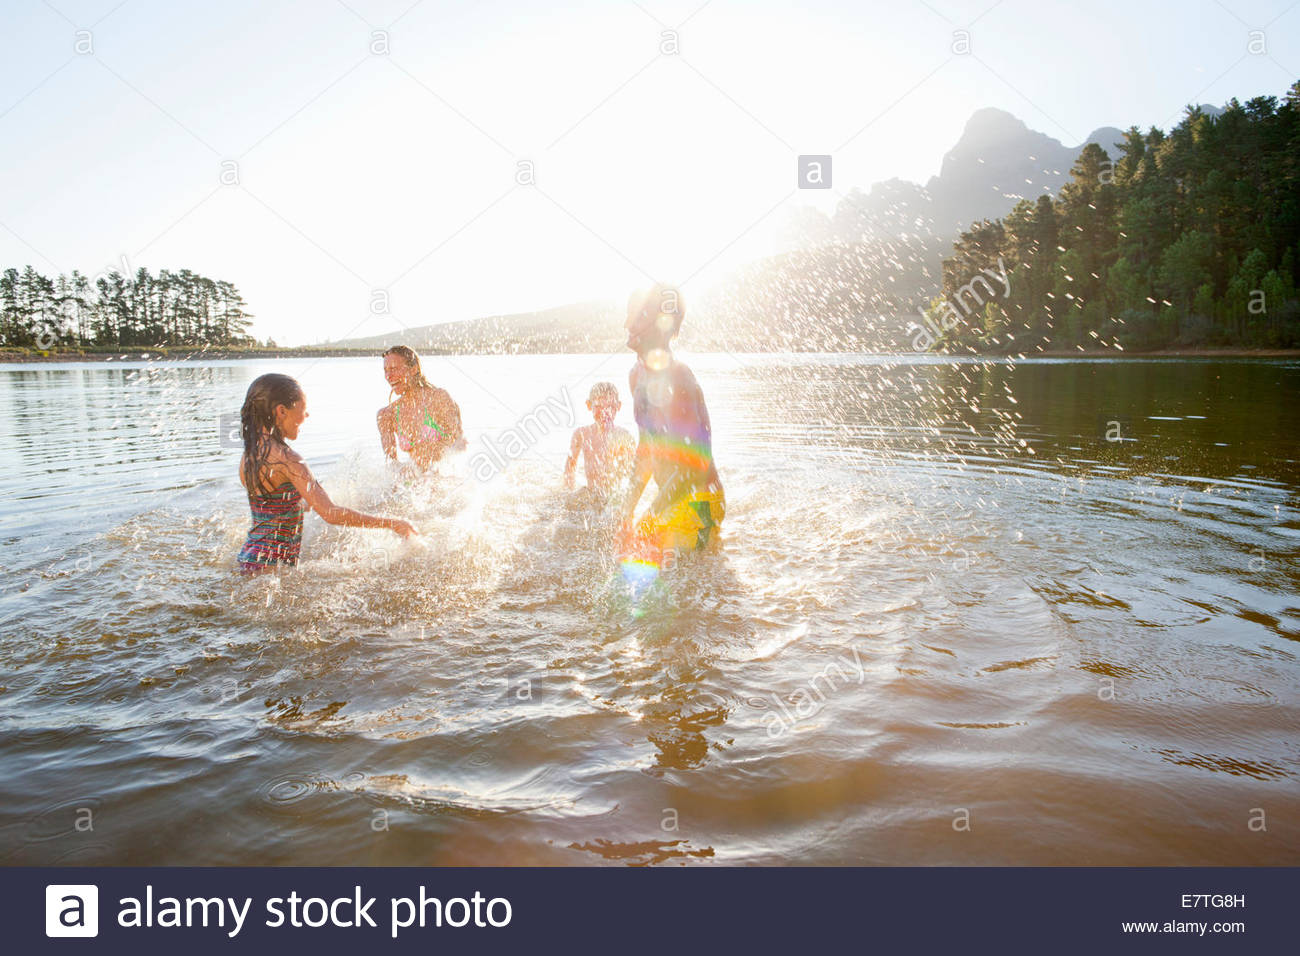 Family splashing each other in lake - Stock Image